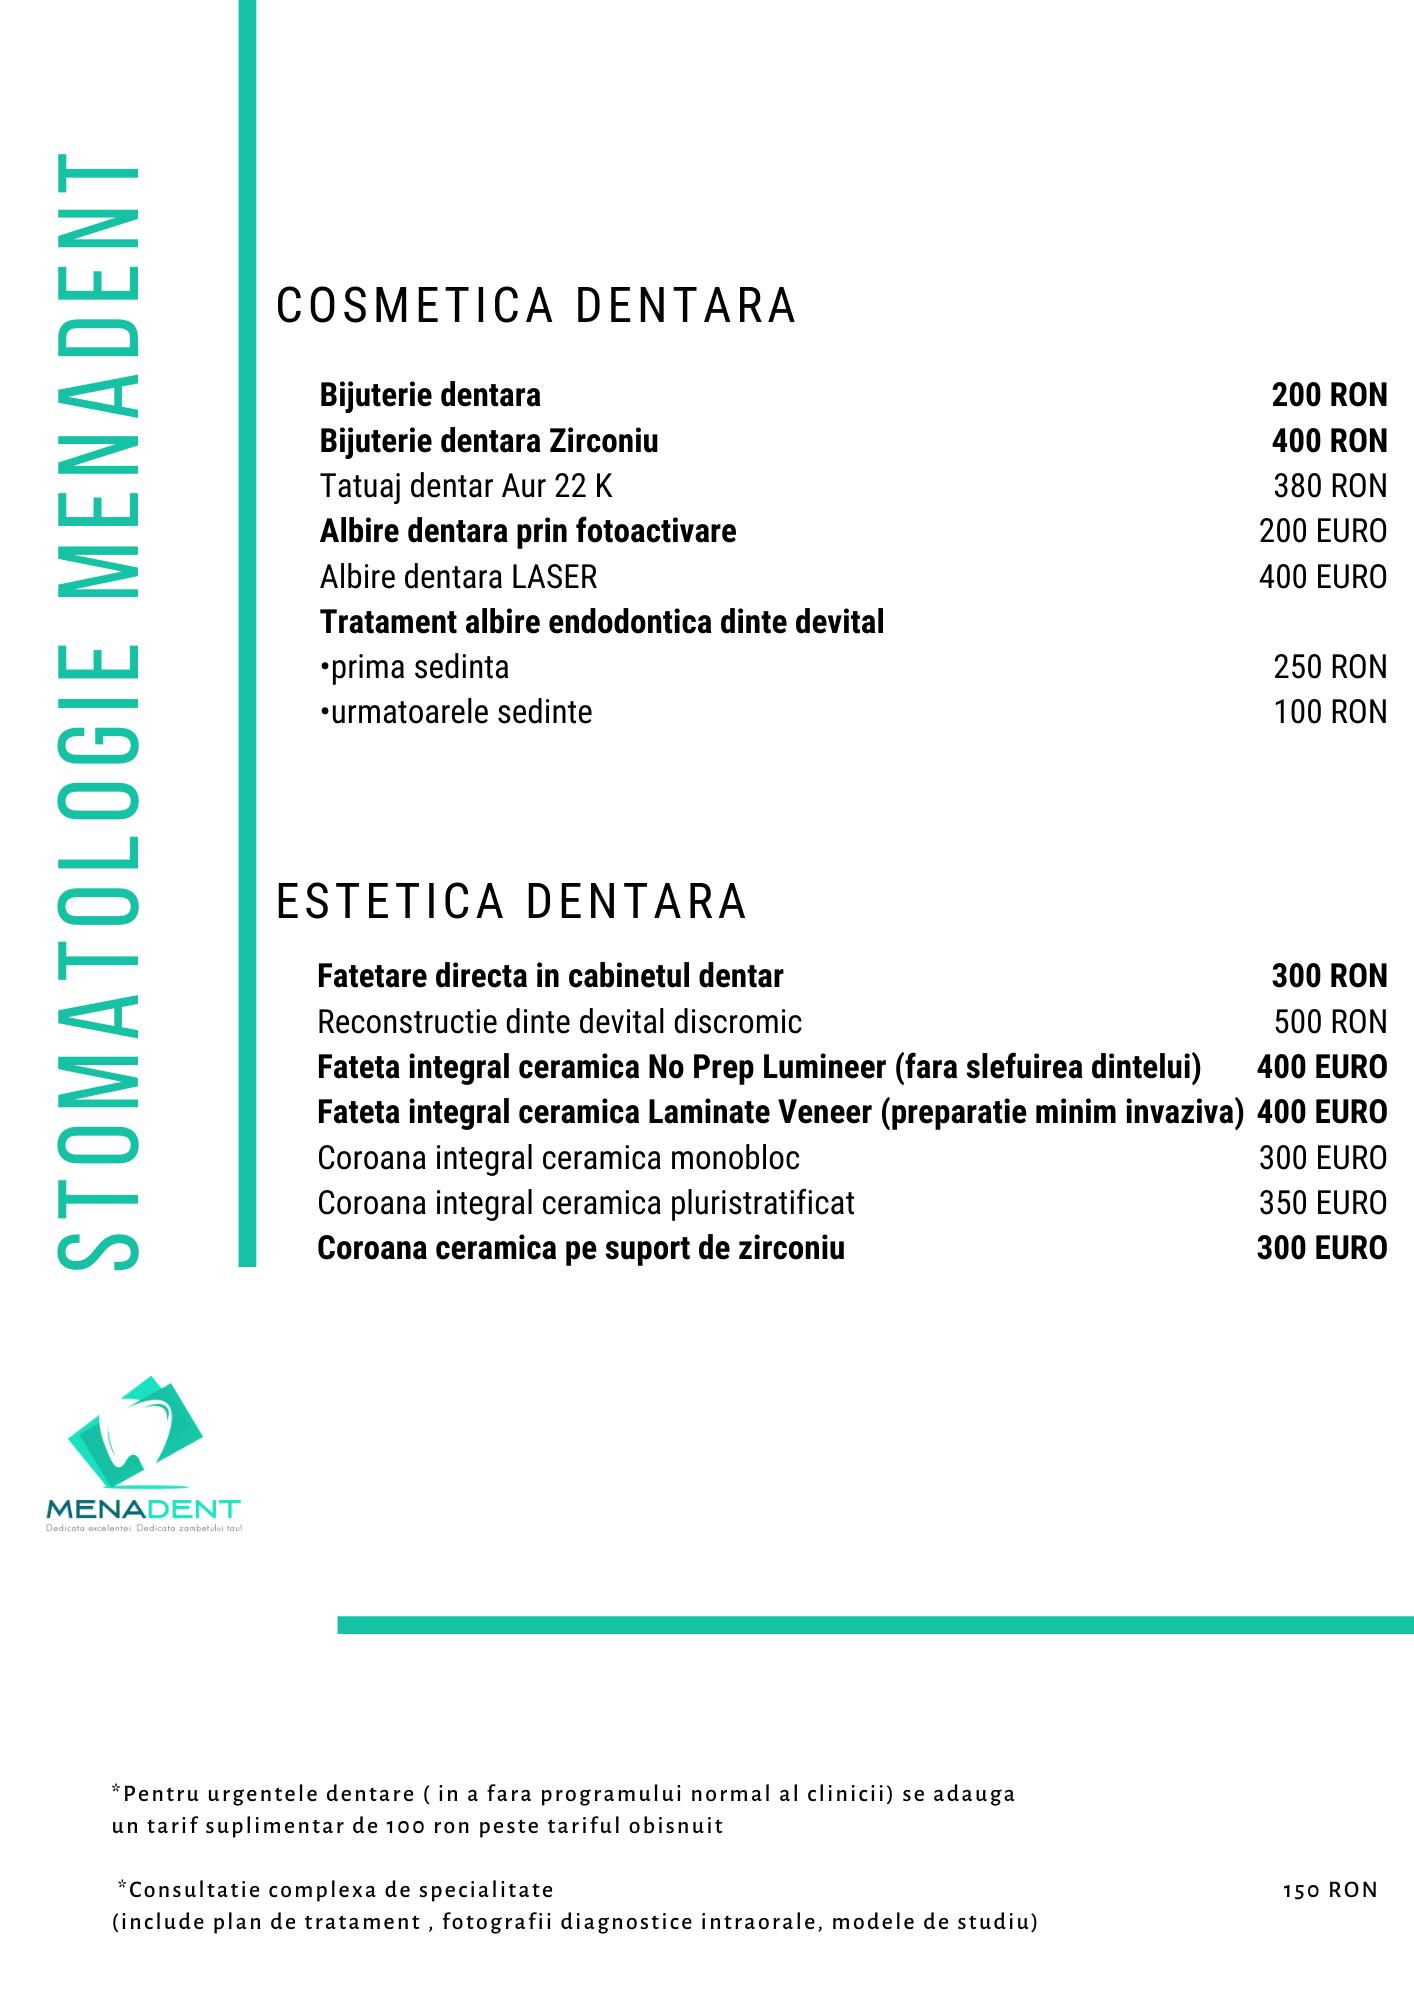 Copy of COSMETICA DENTARA